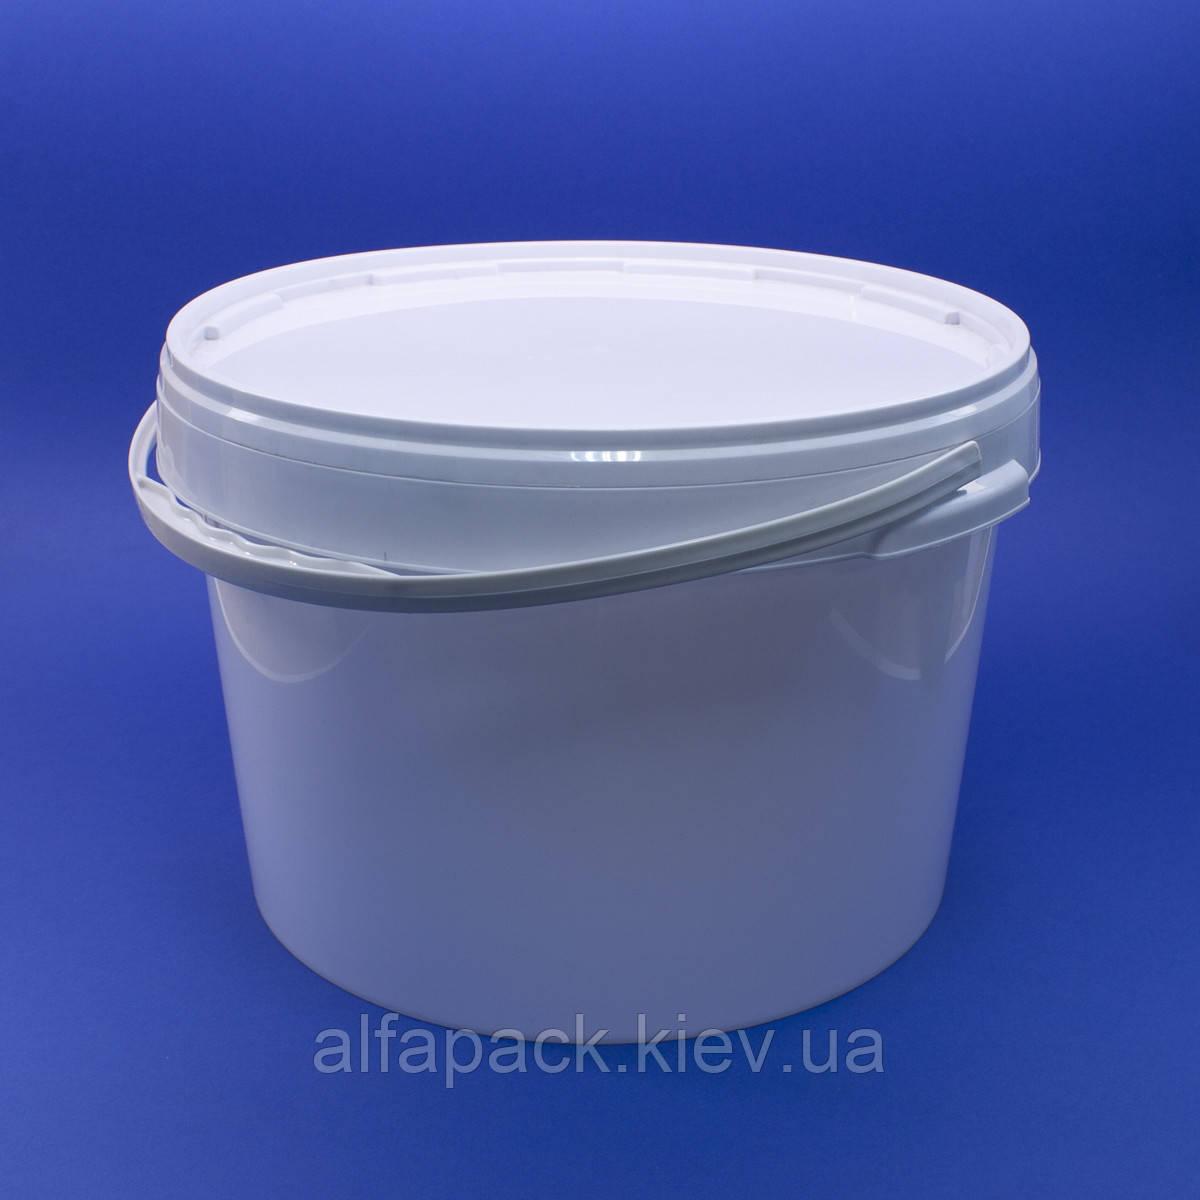 Ведро пластиковое белое 15,7 л